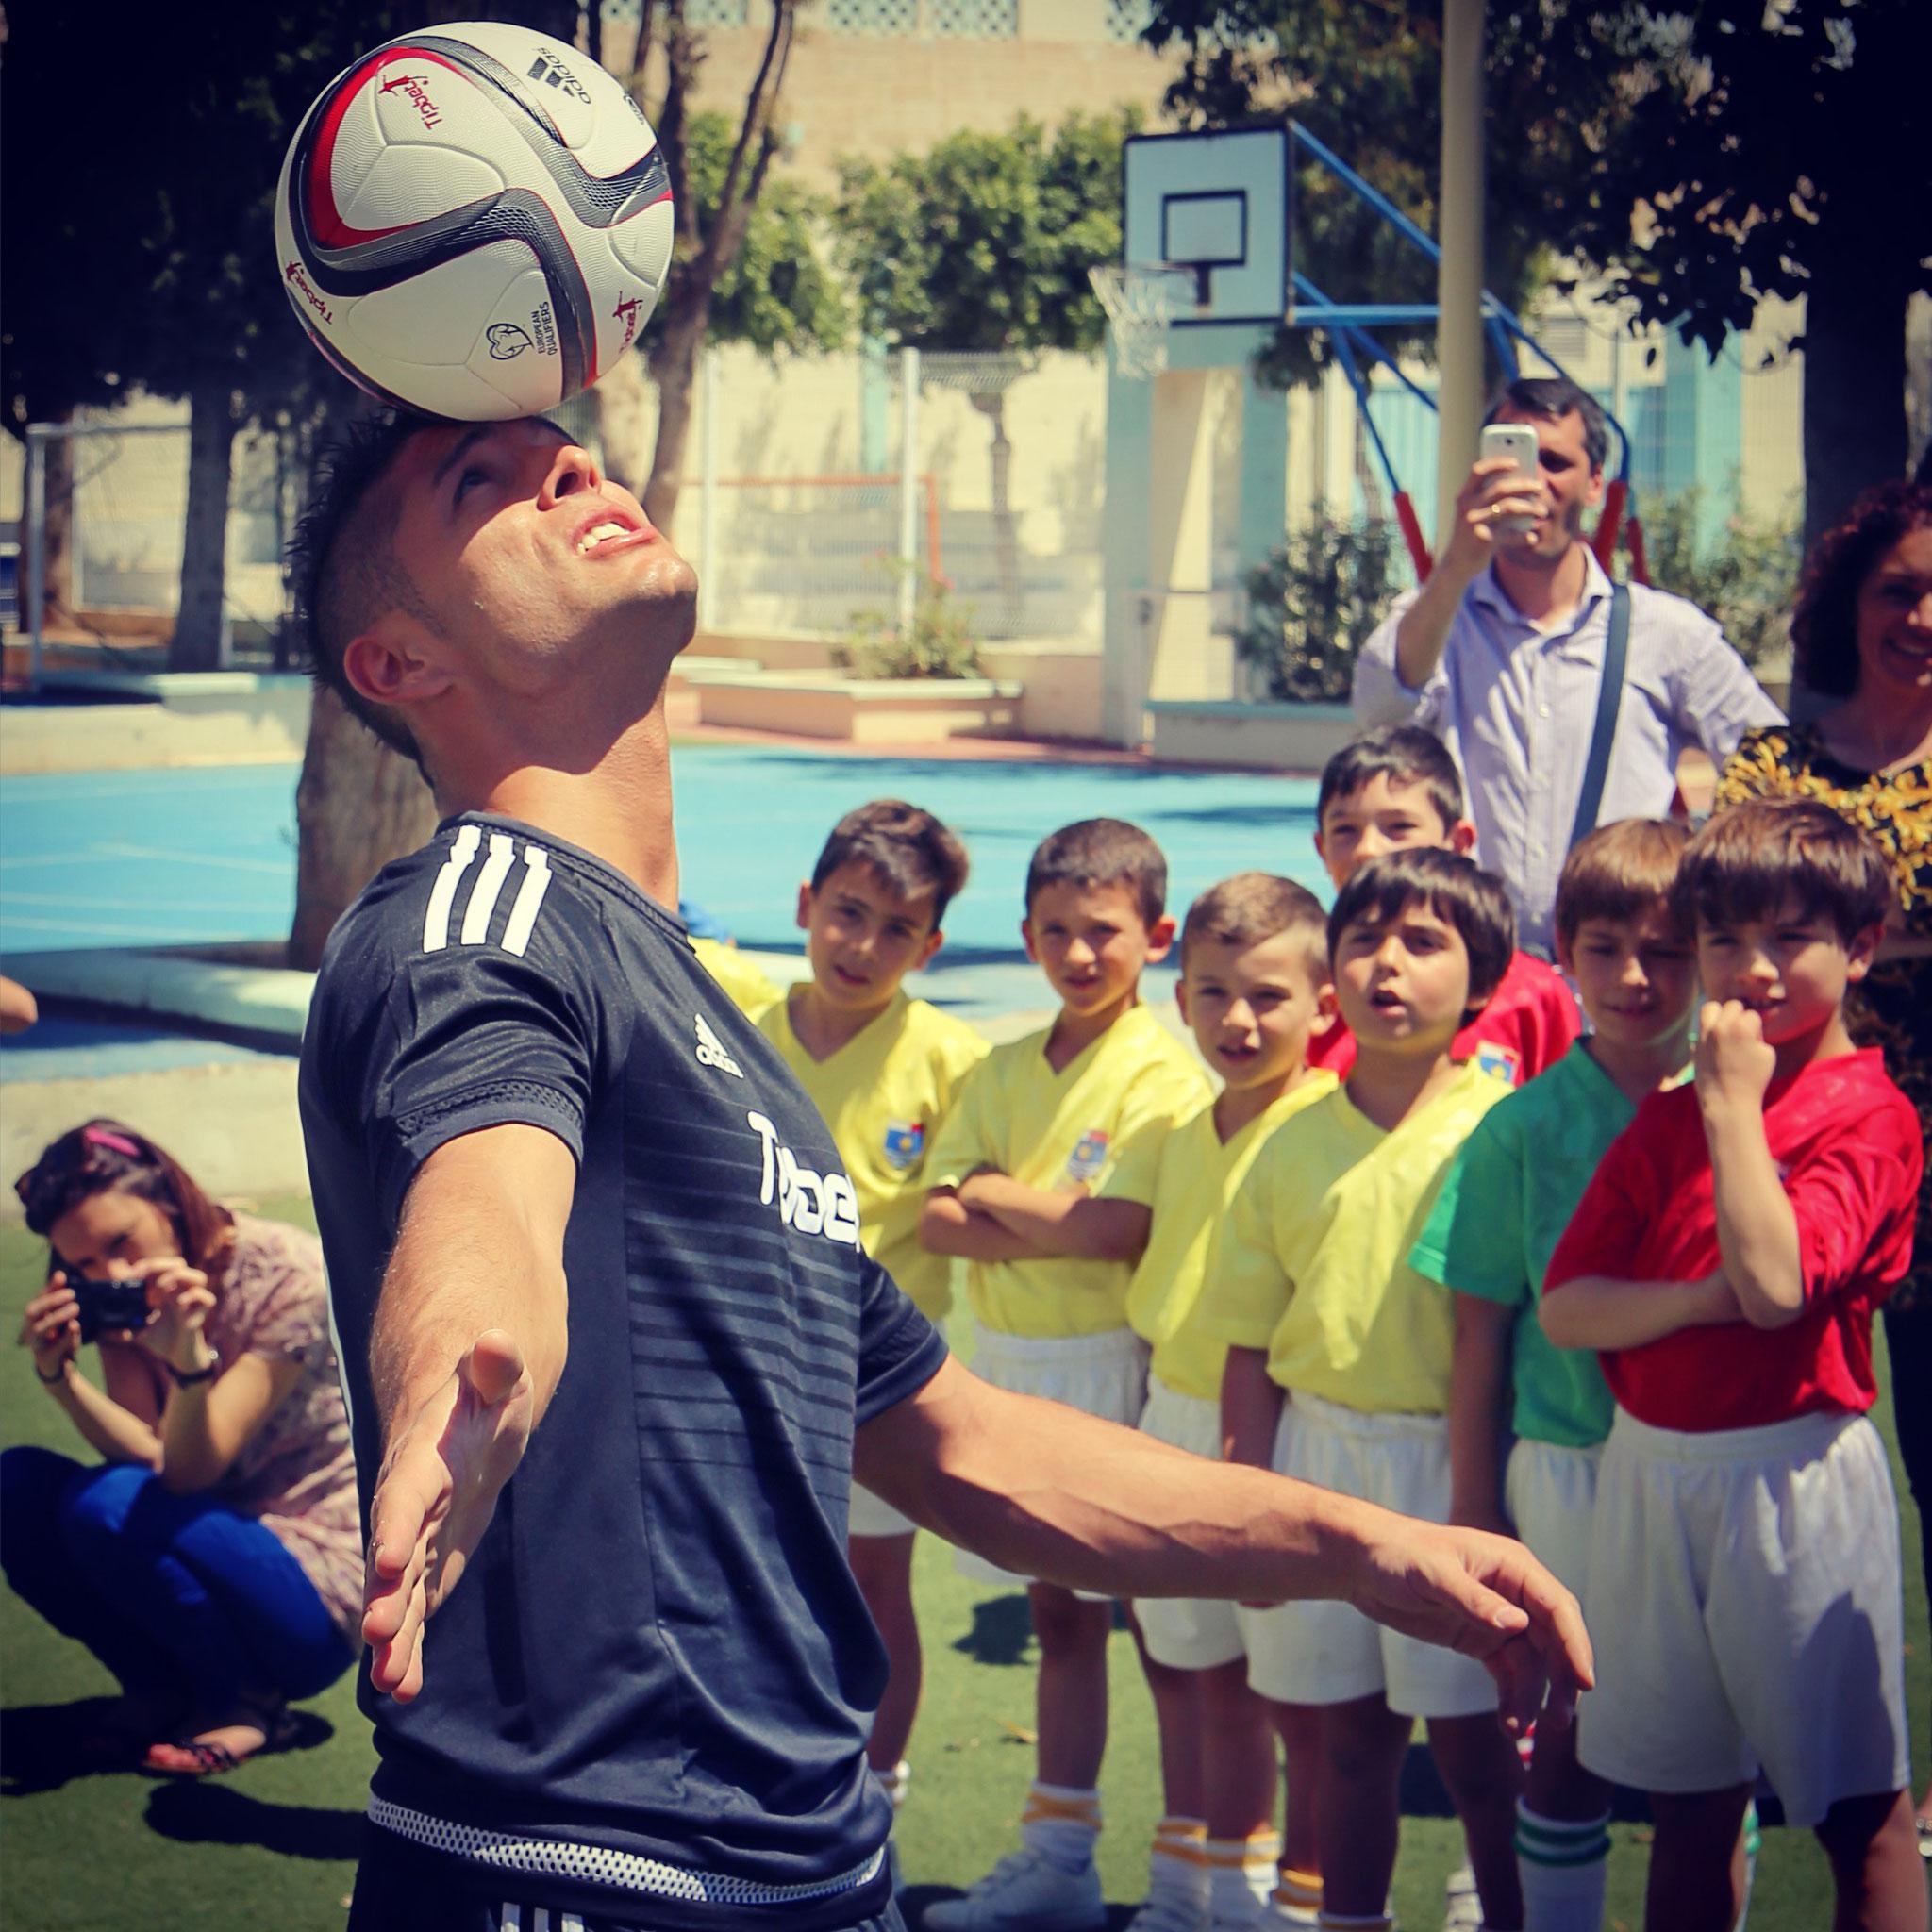 Fussball Freestyle Trick, den Ball mit dem Kopf balancieren